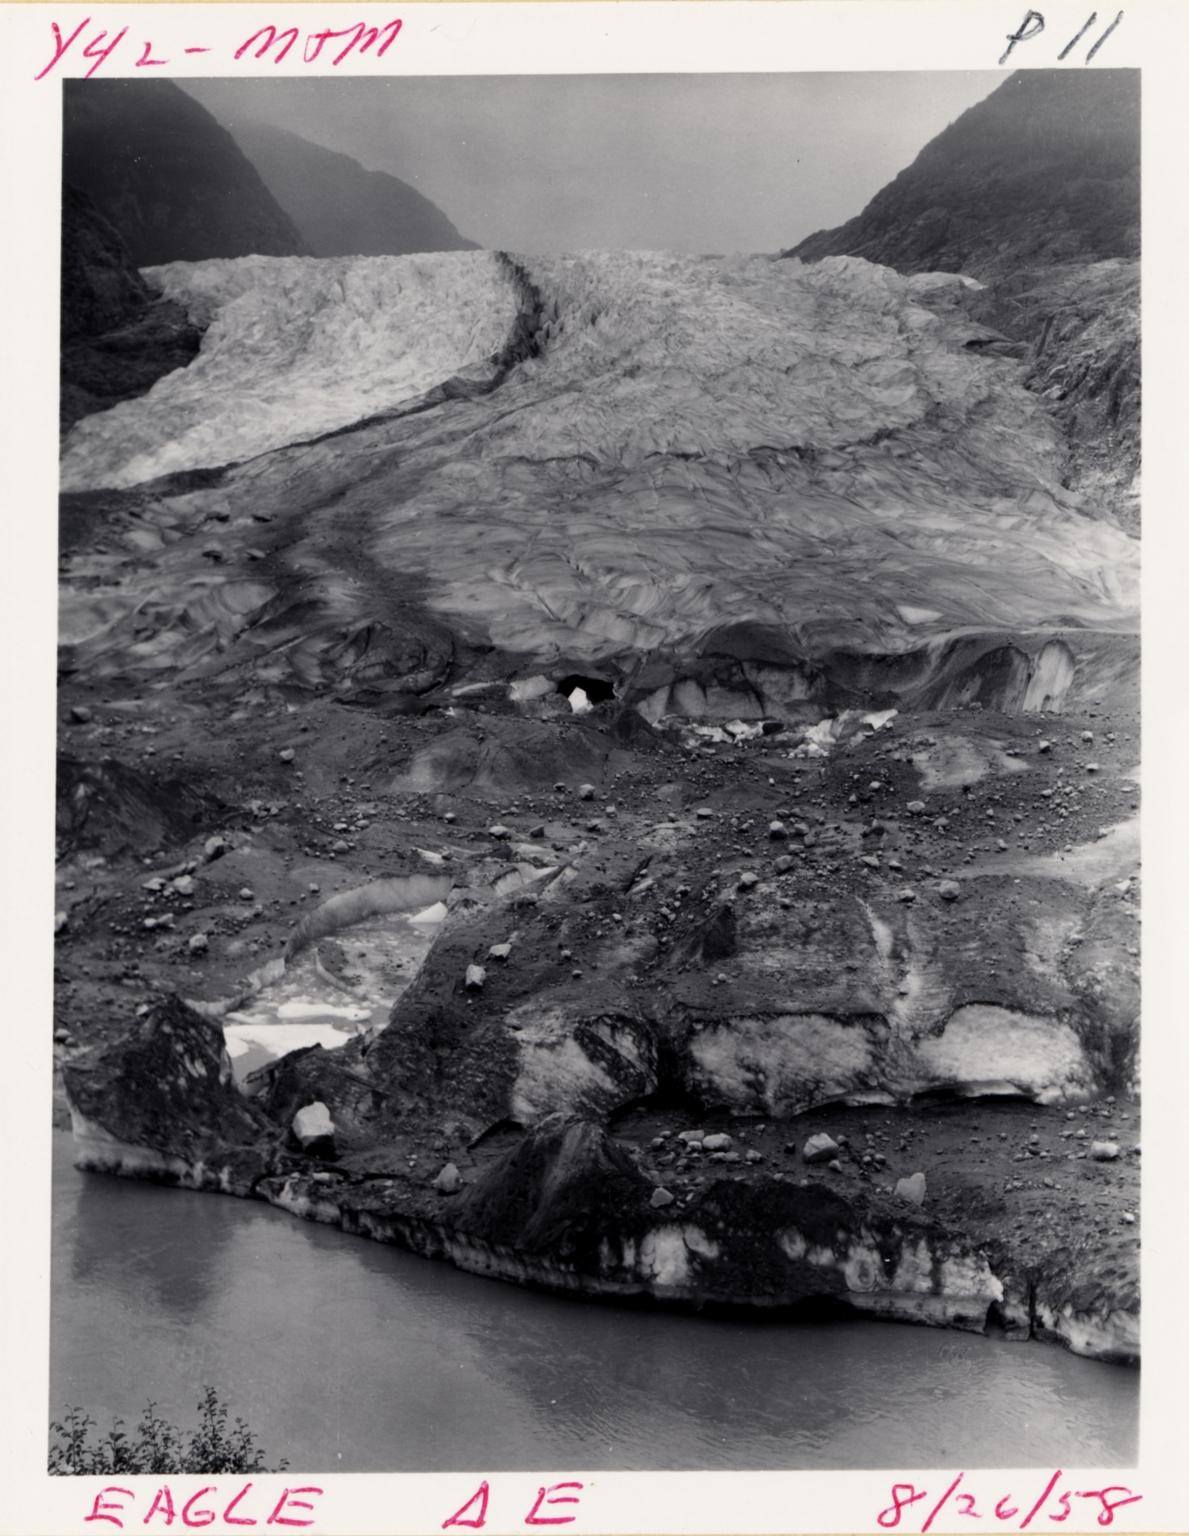 Eagle Glacier (Anchorage), Alaska, United States